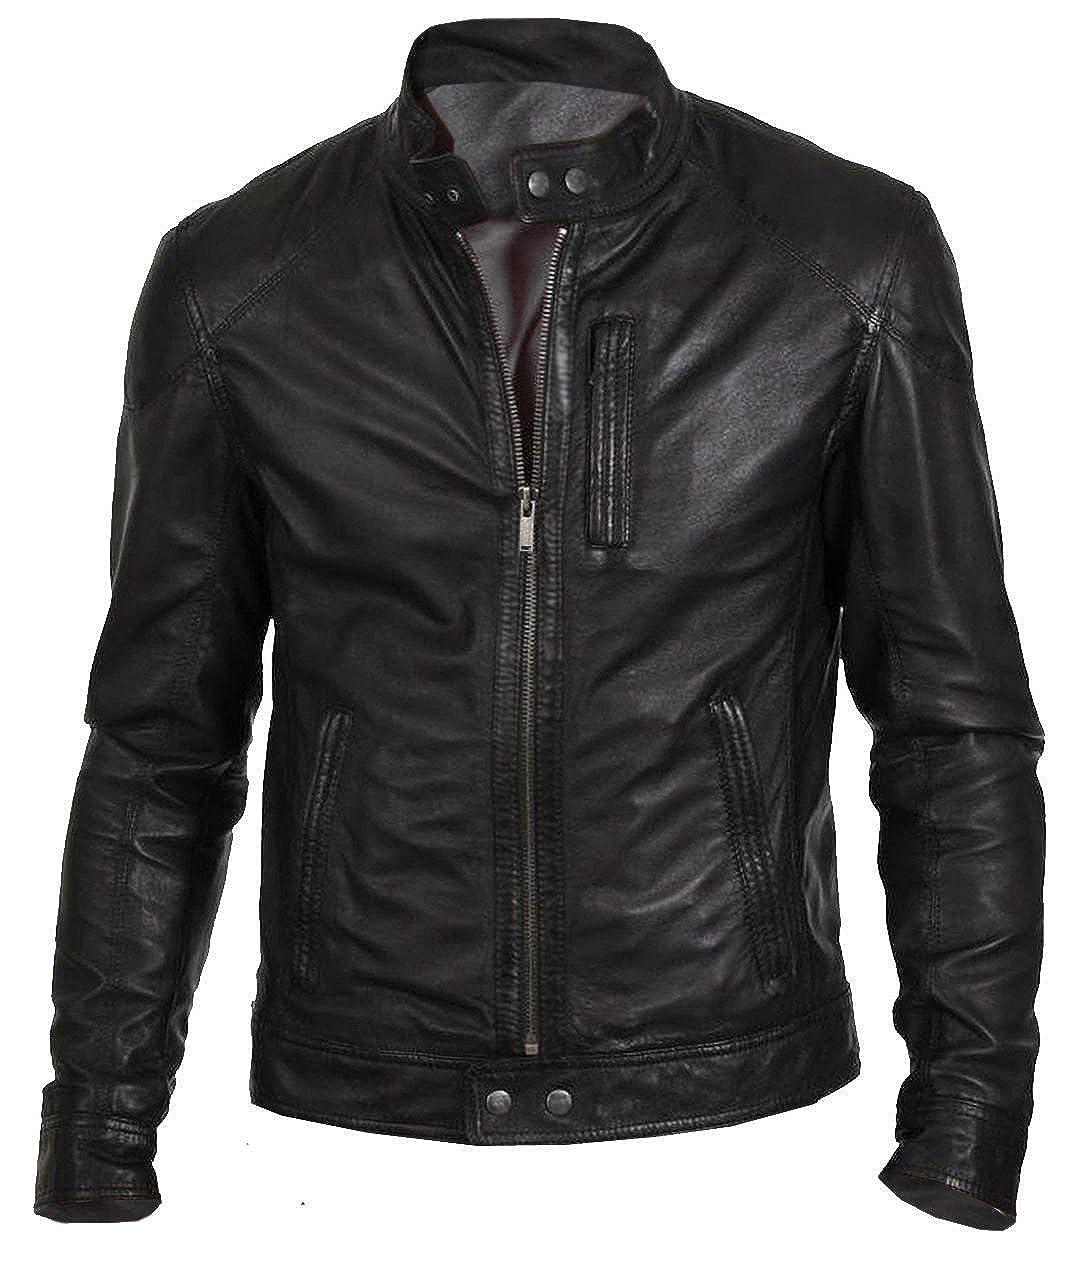 The Sparks Up Inc. Biker Hunt Stylish Fashion Casual Weat Genuine Leather Jacket